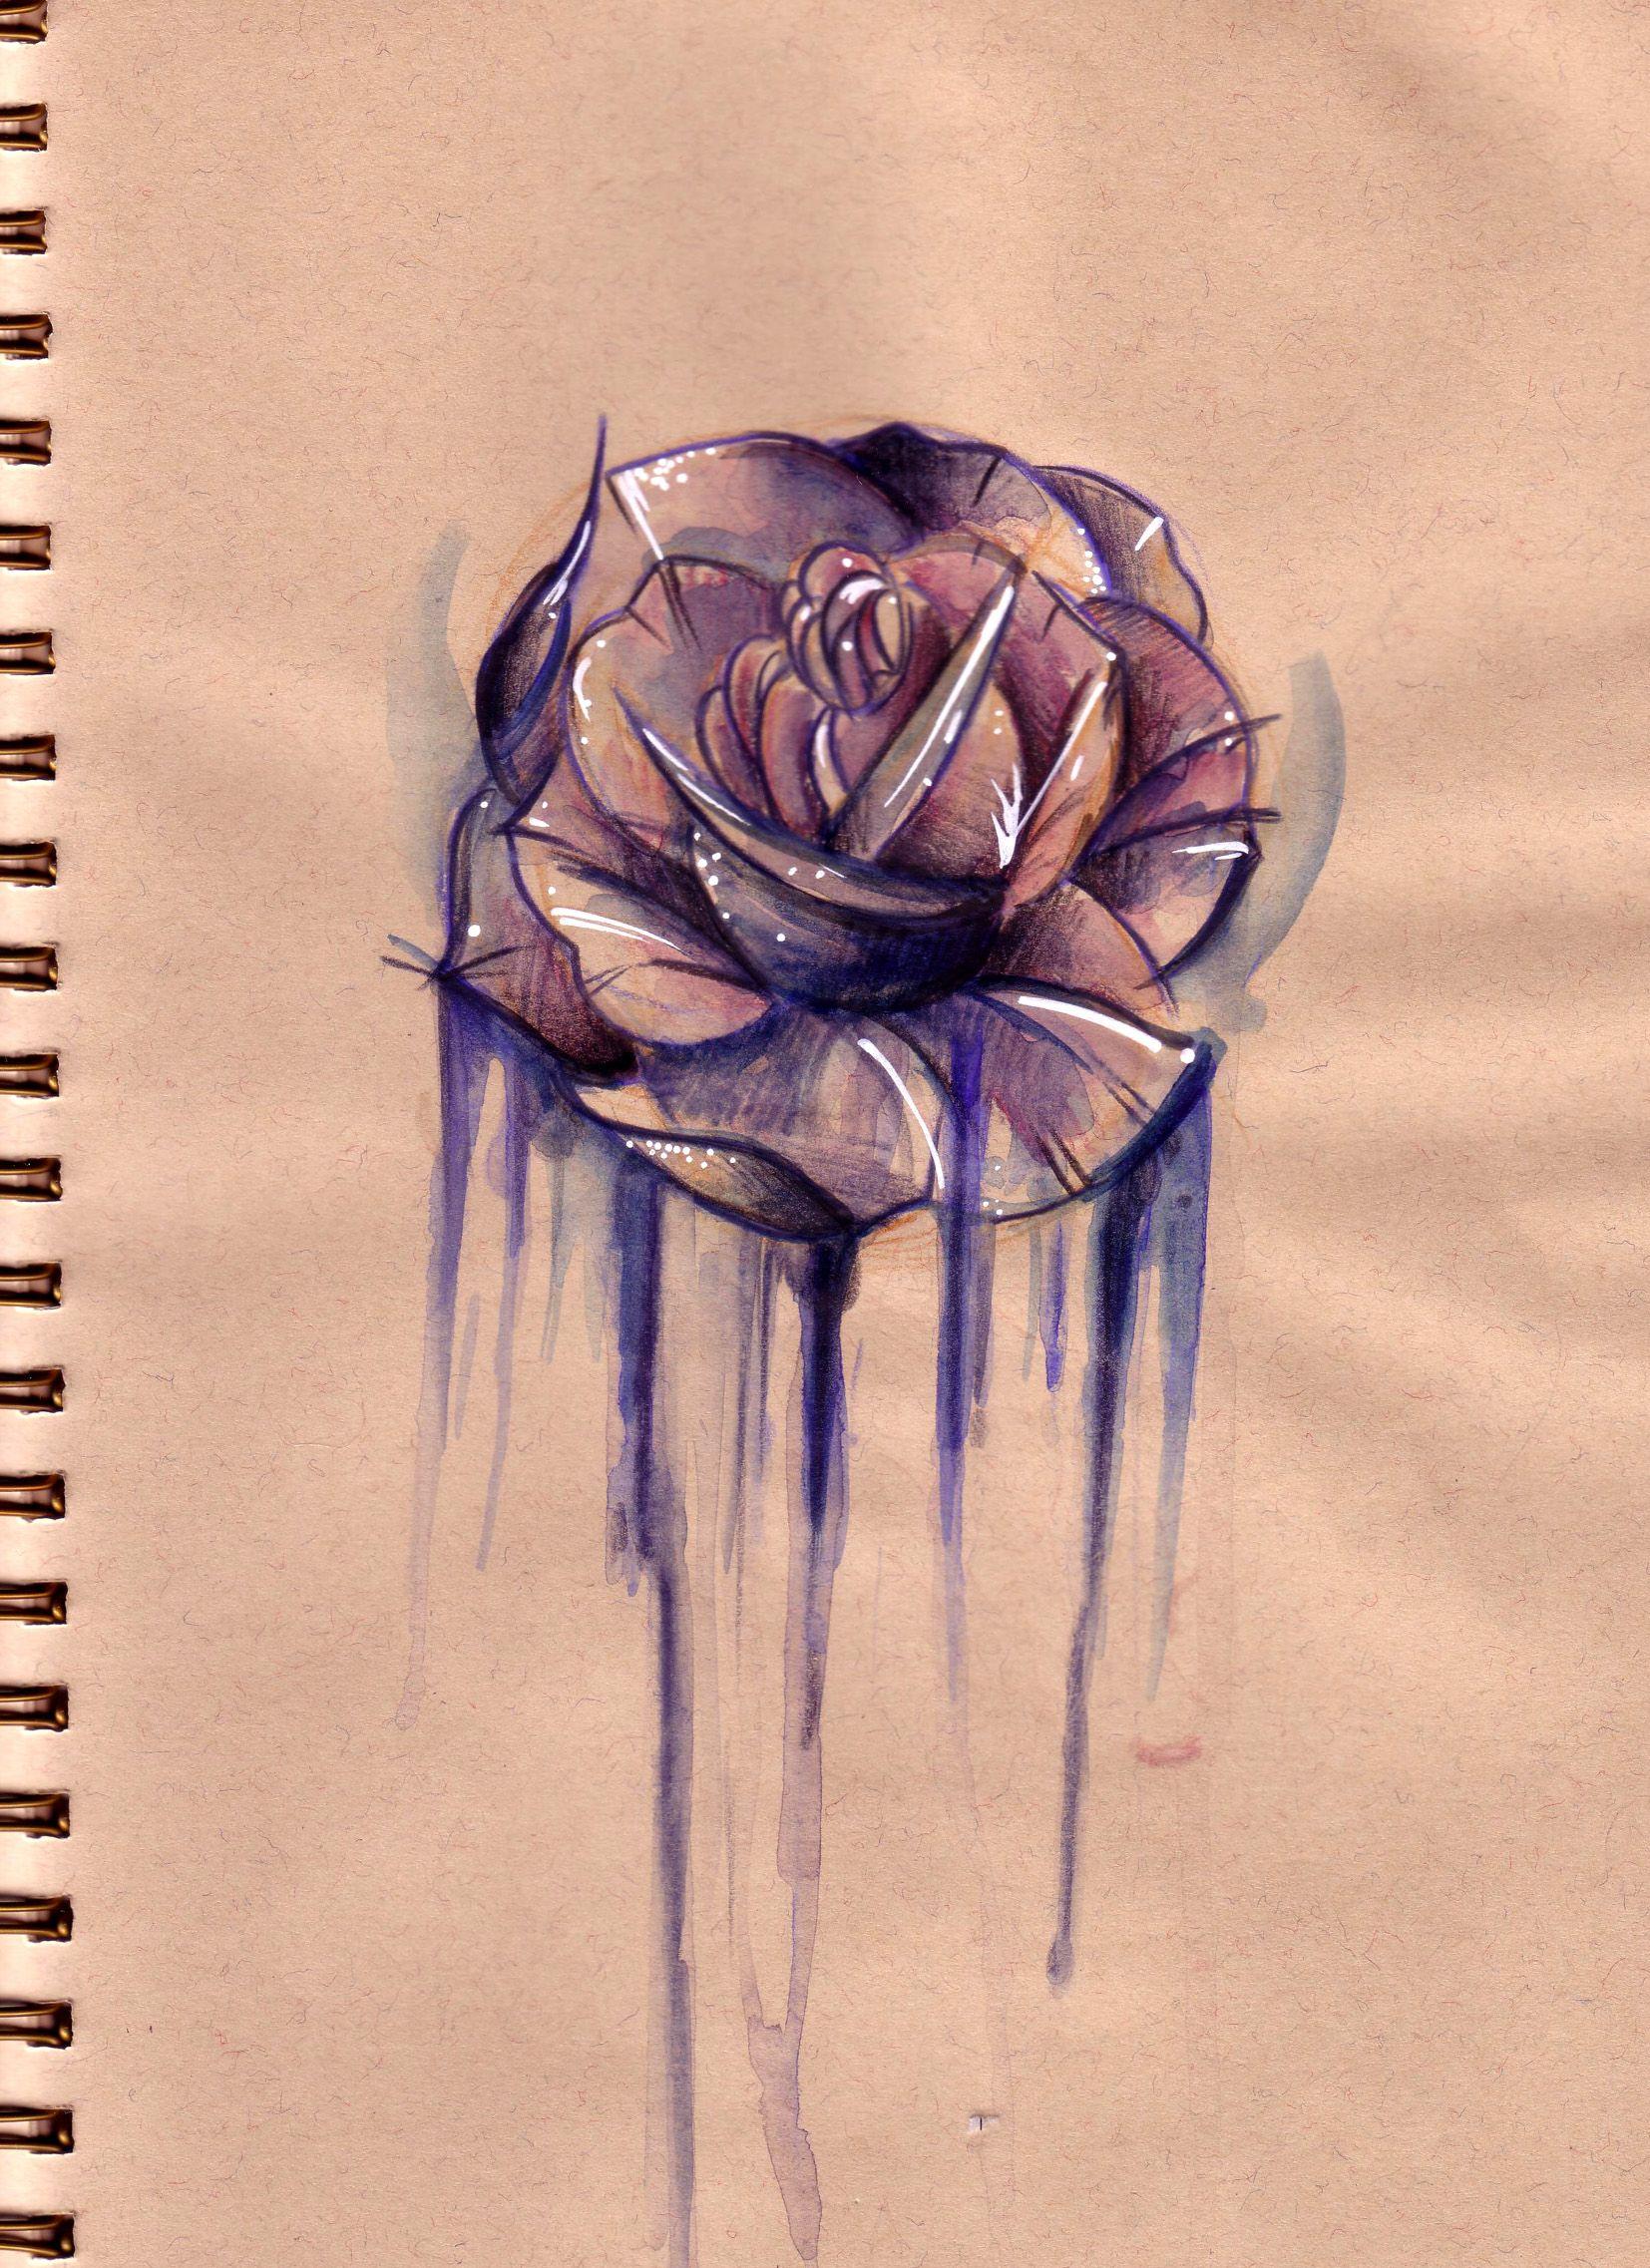 Rose sketch charlotte ross tattoo tattoo pinterest rose